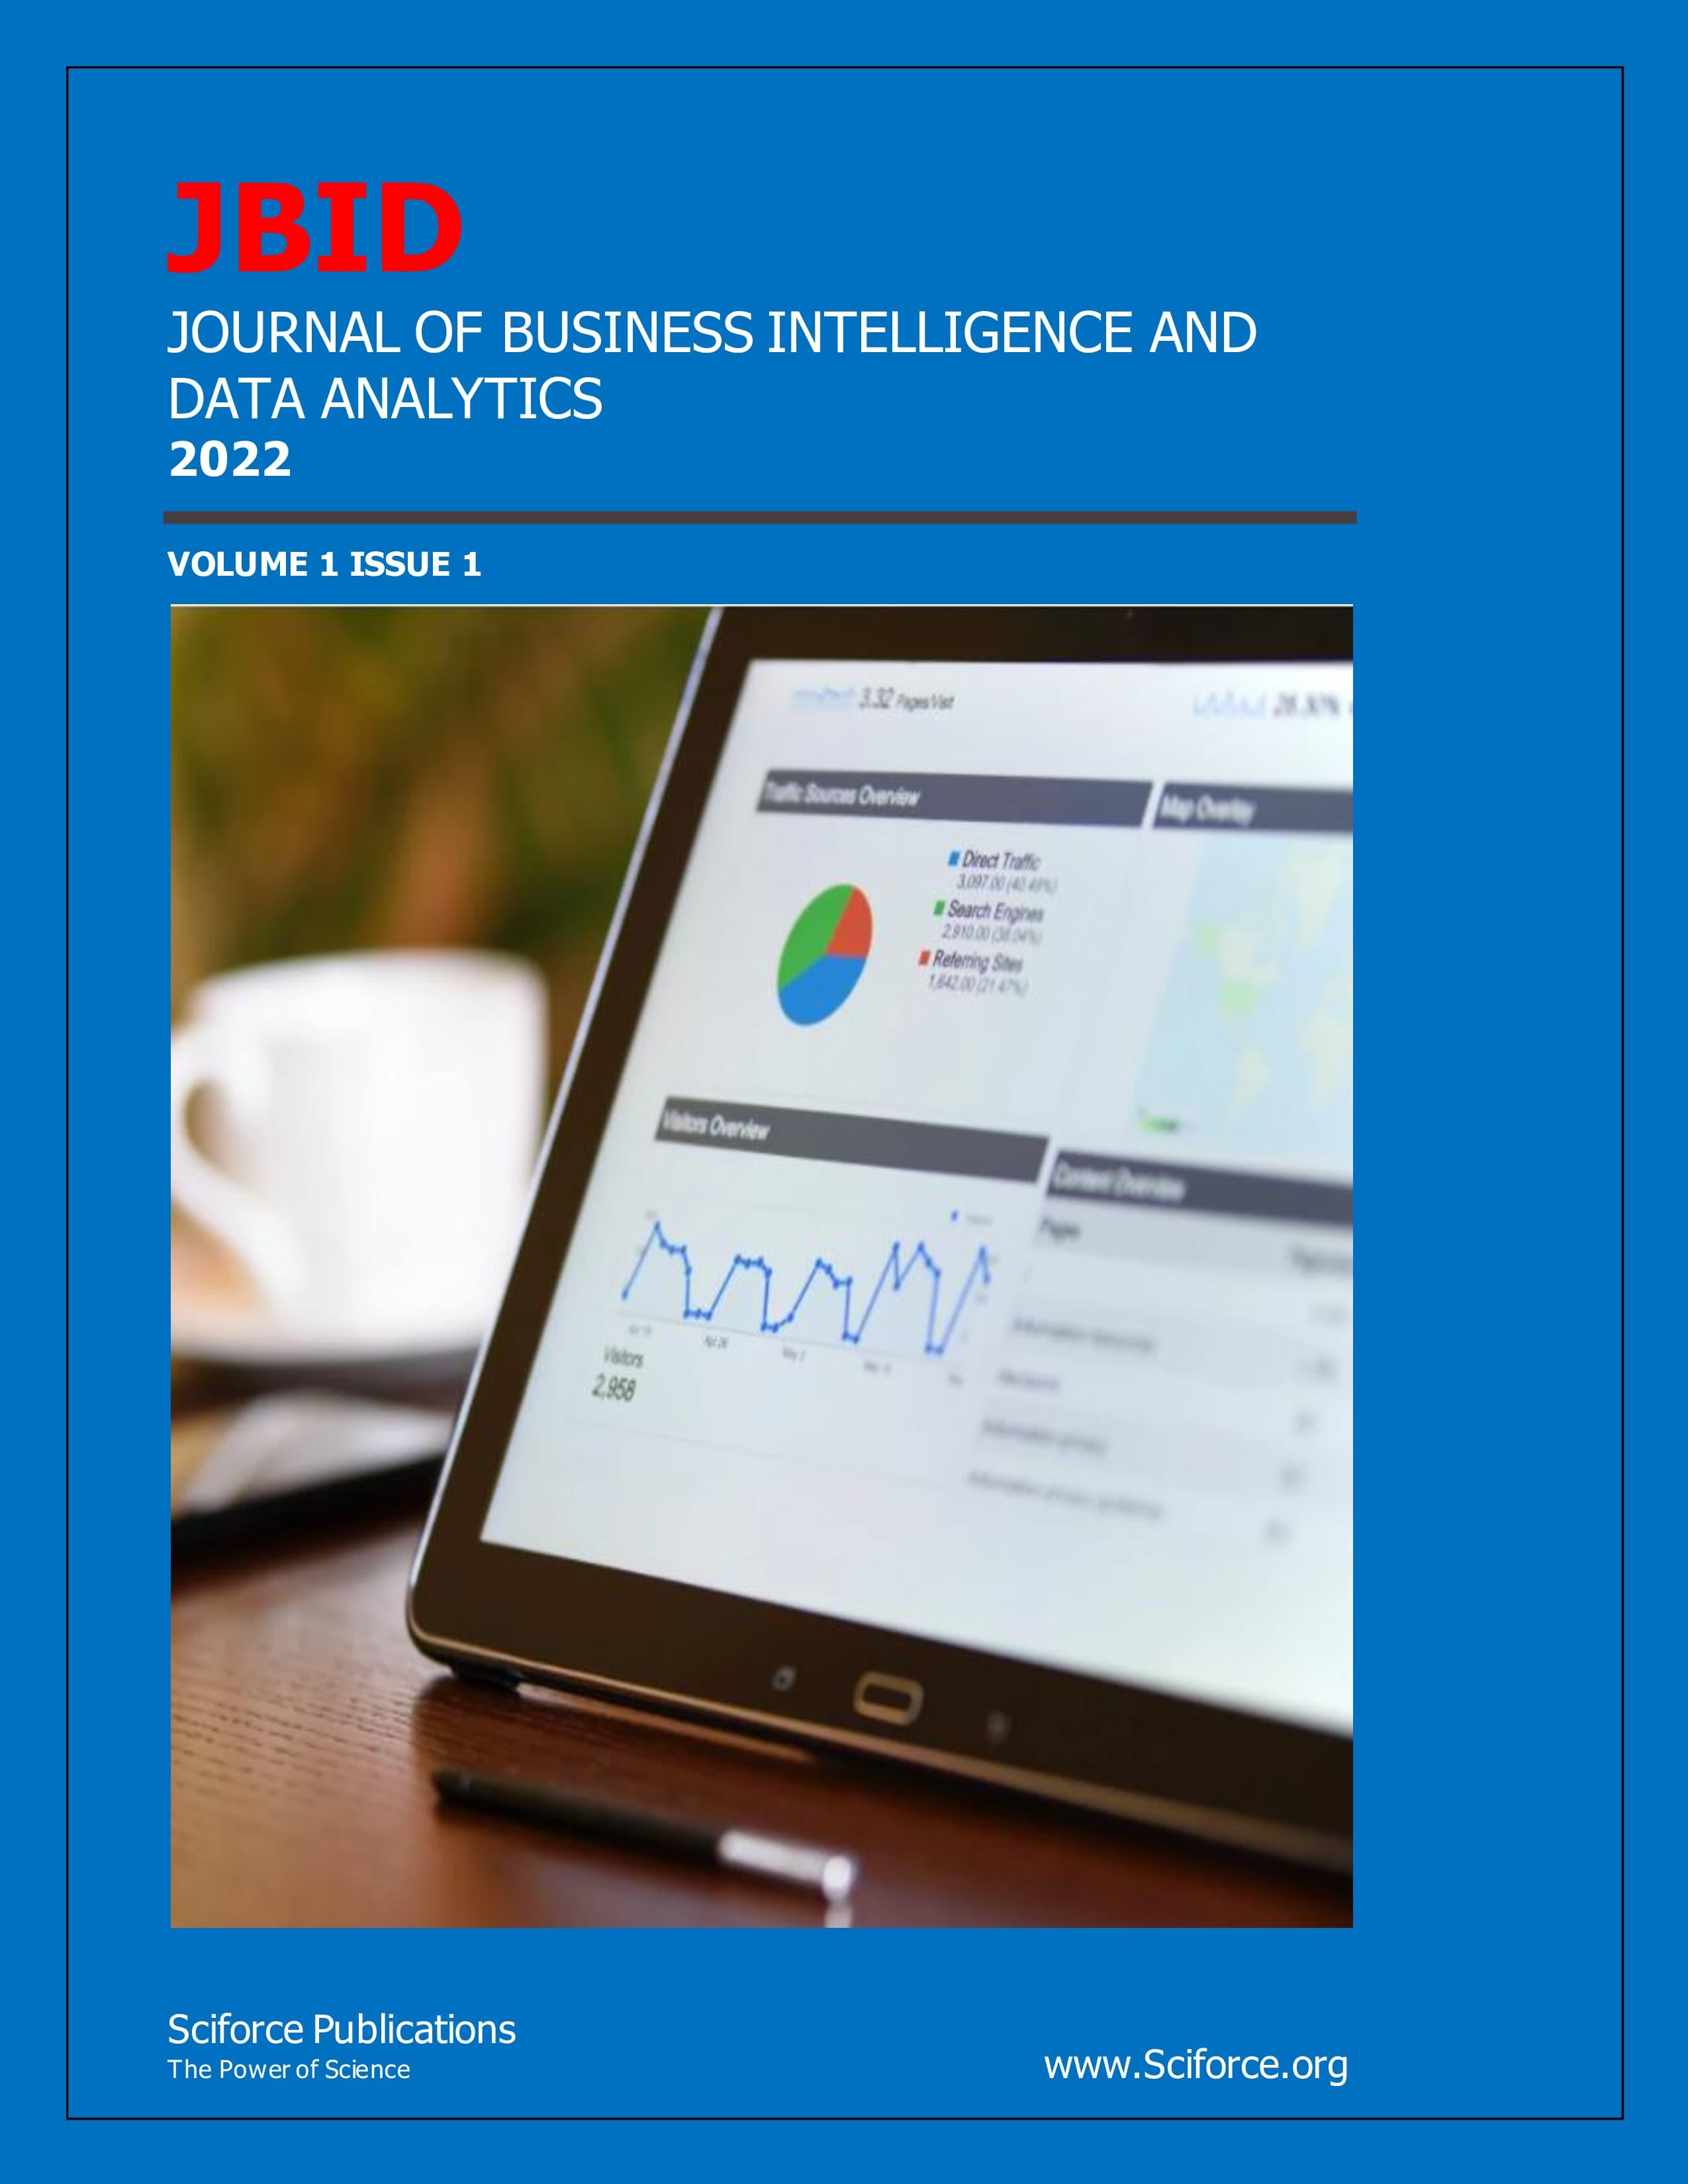 Journal of Business Intelligence and Data Analytics